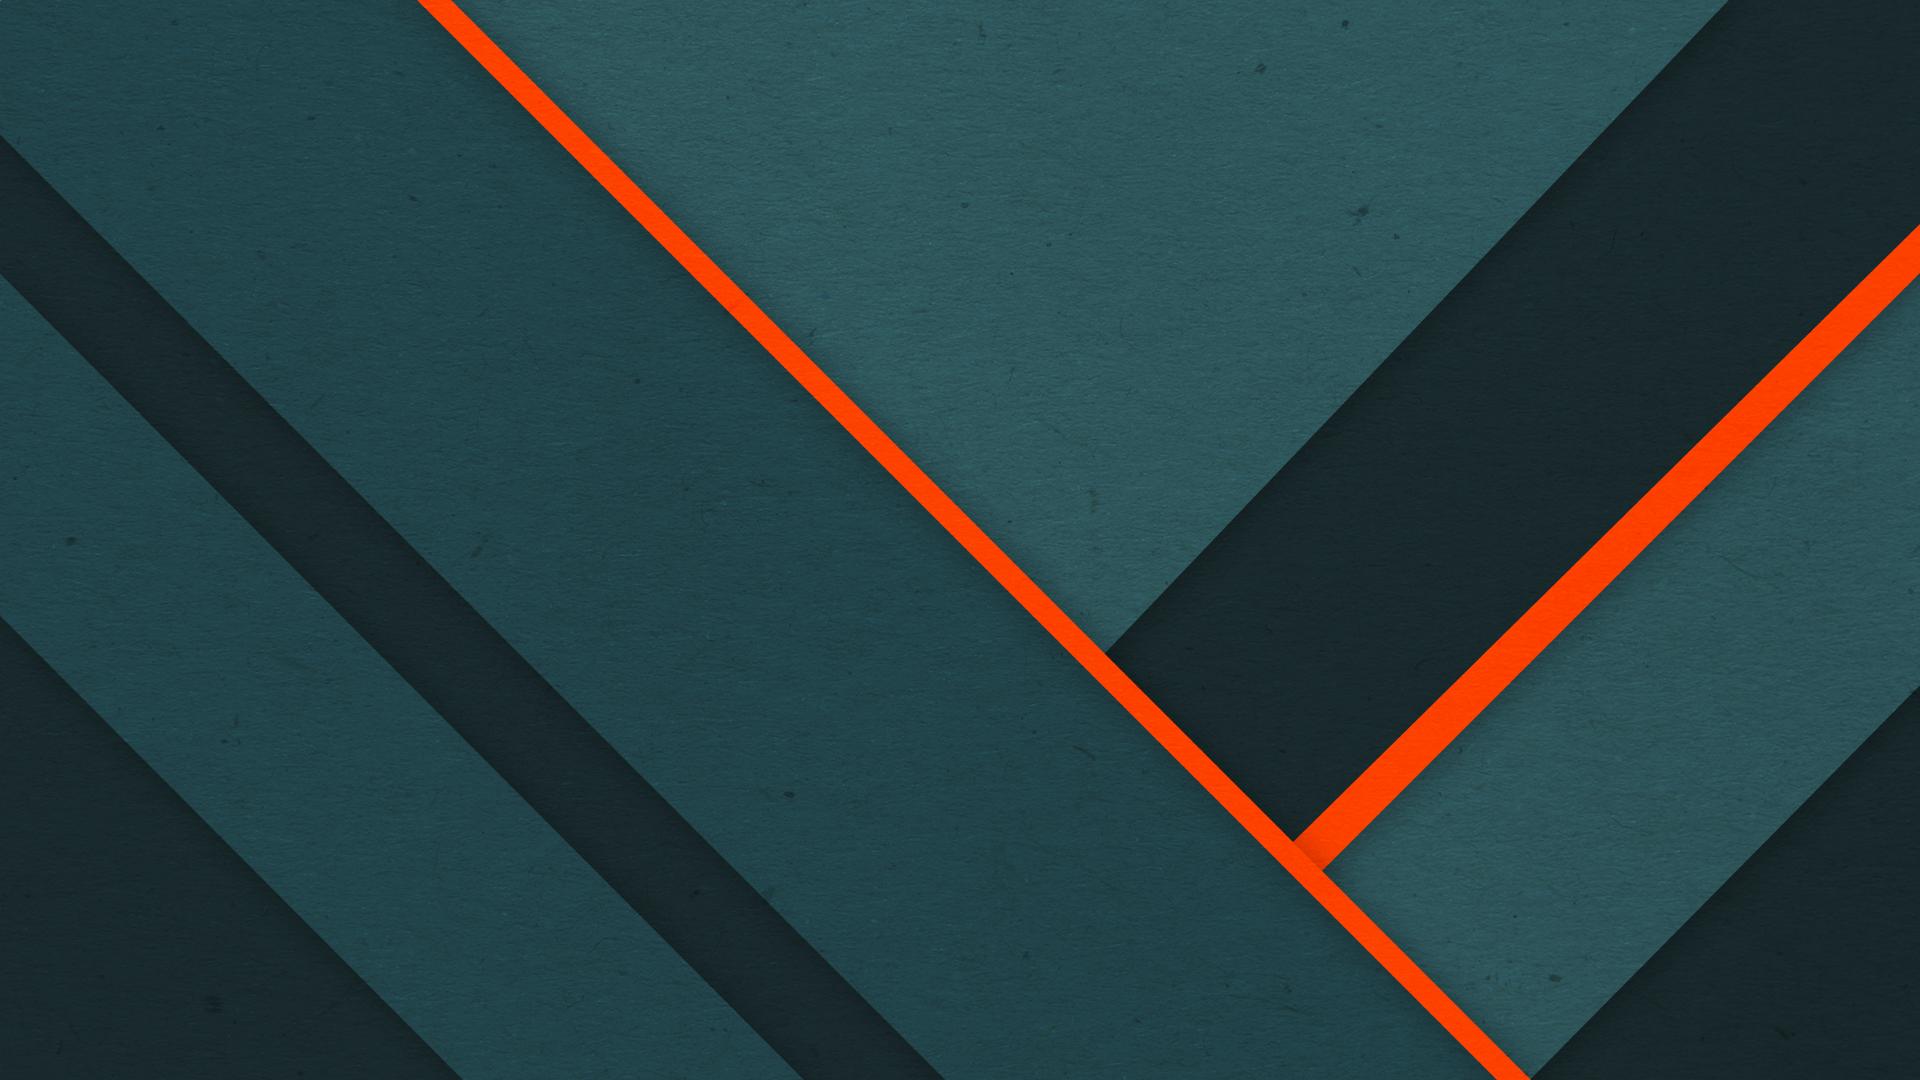 Wallpaper : black, red, symmetry, green, blue, triangle